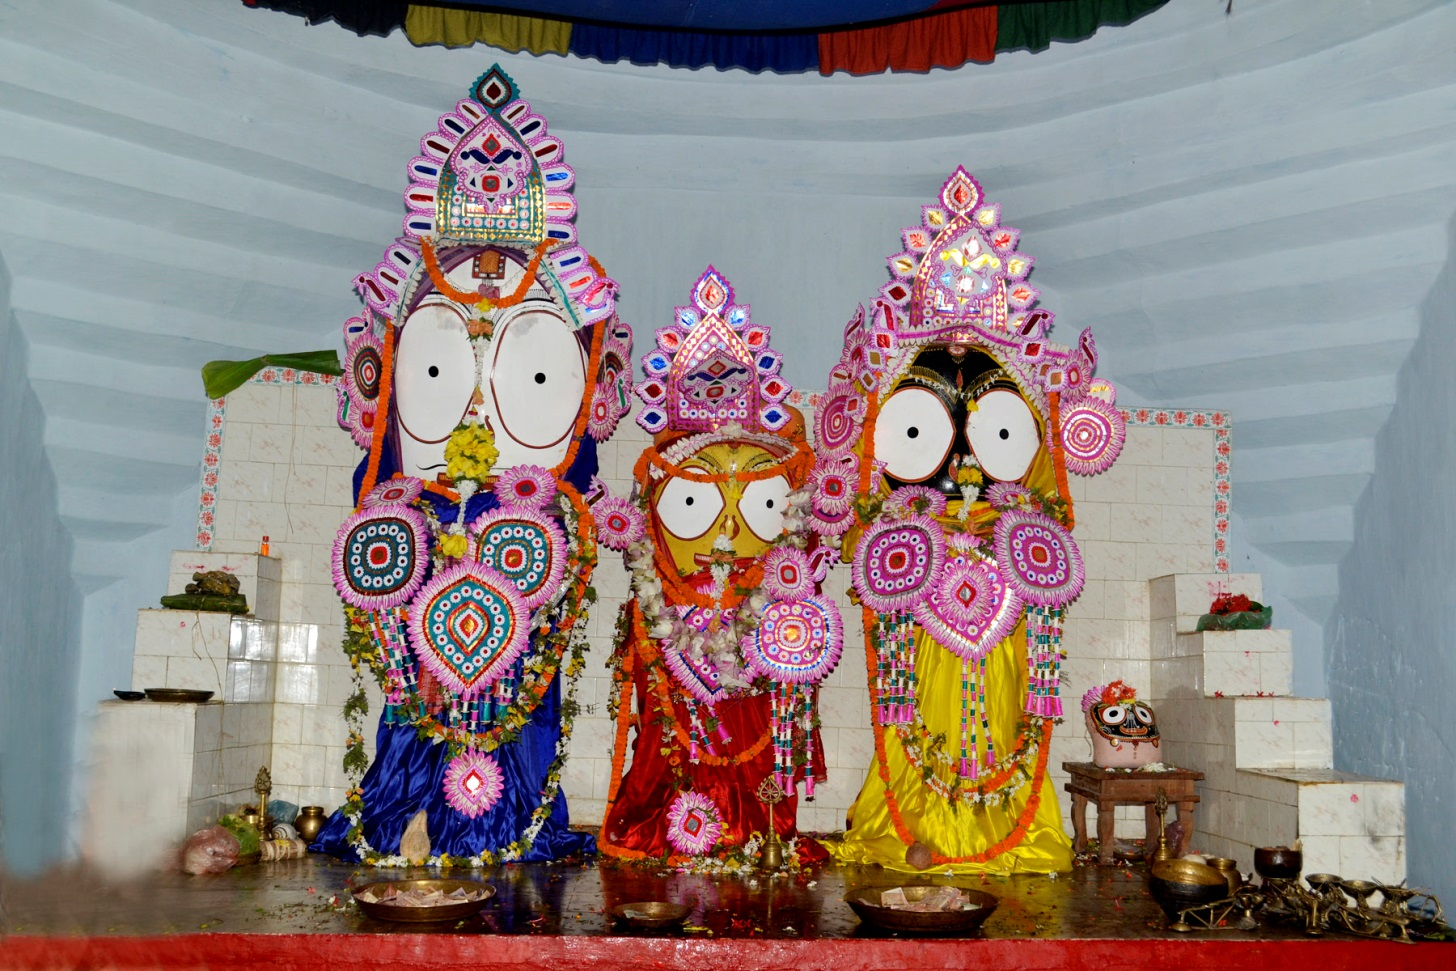 Balabhadra, Subadgra and Jagannath